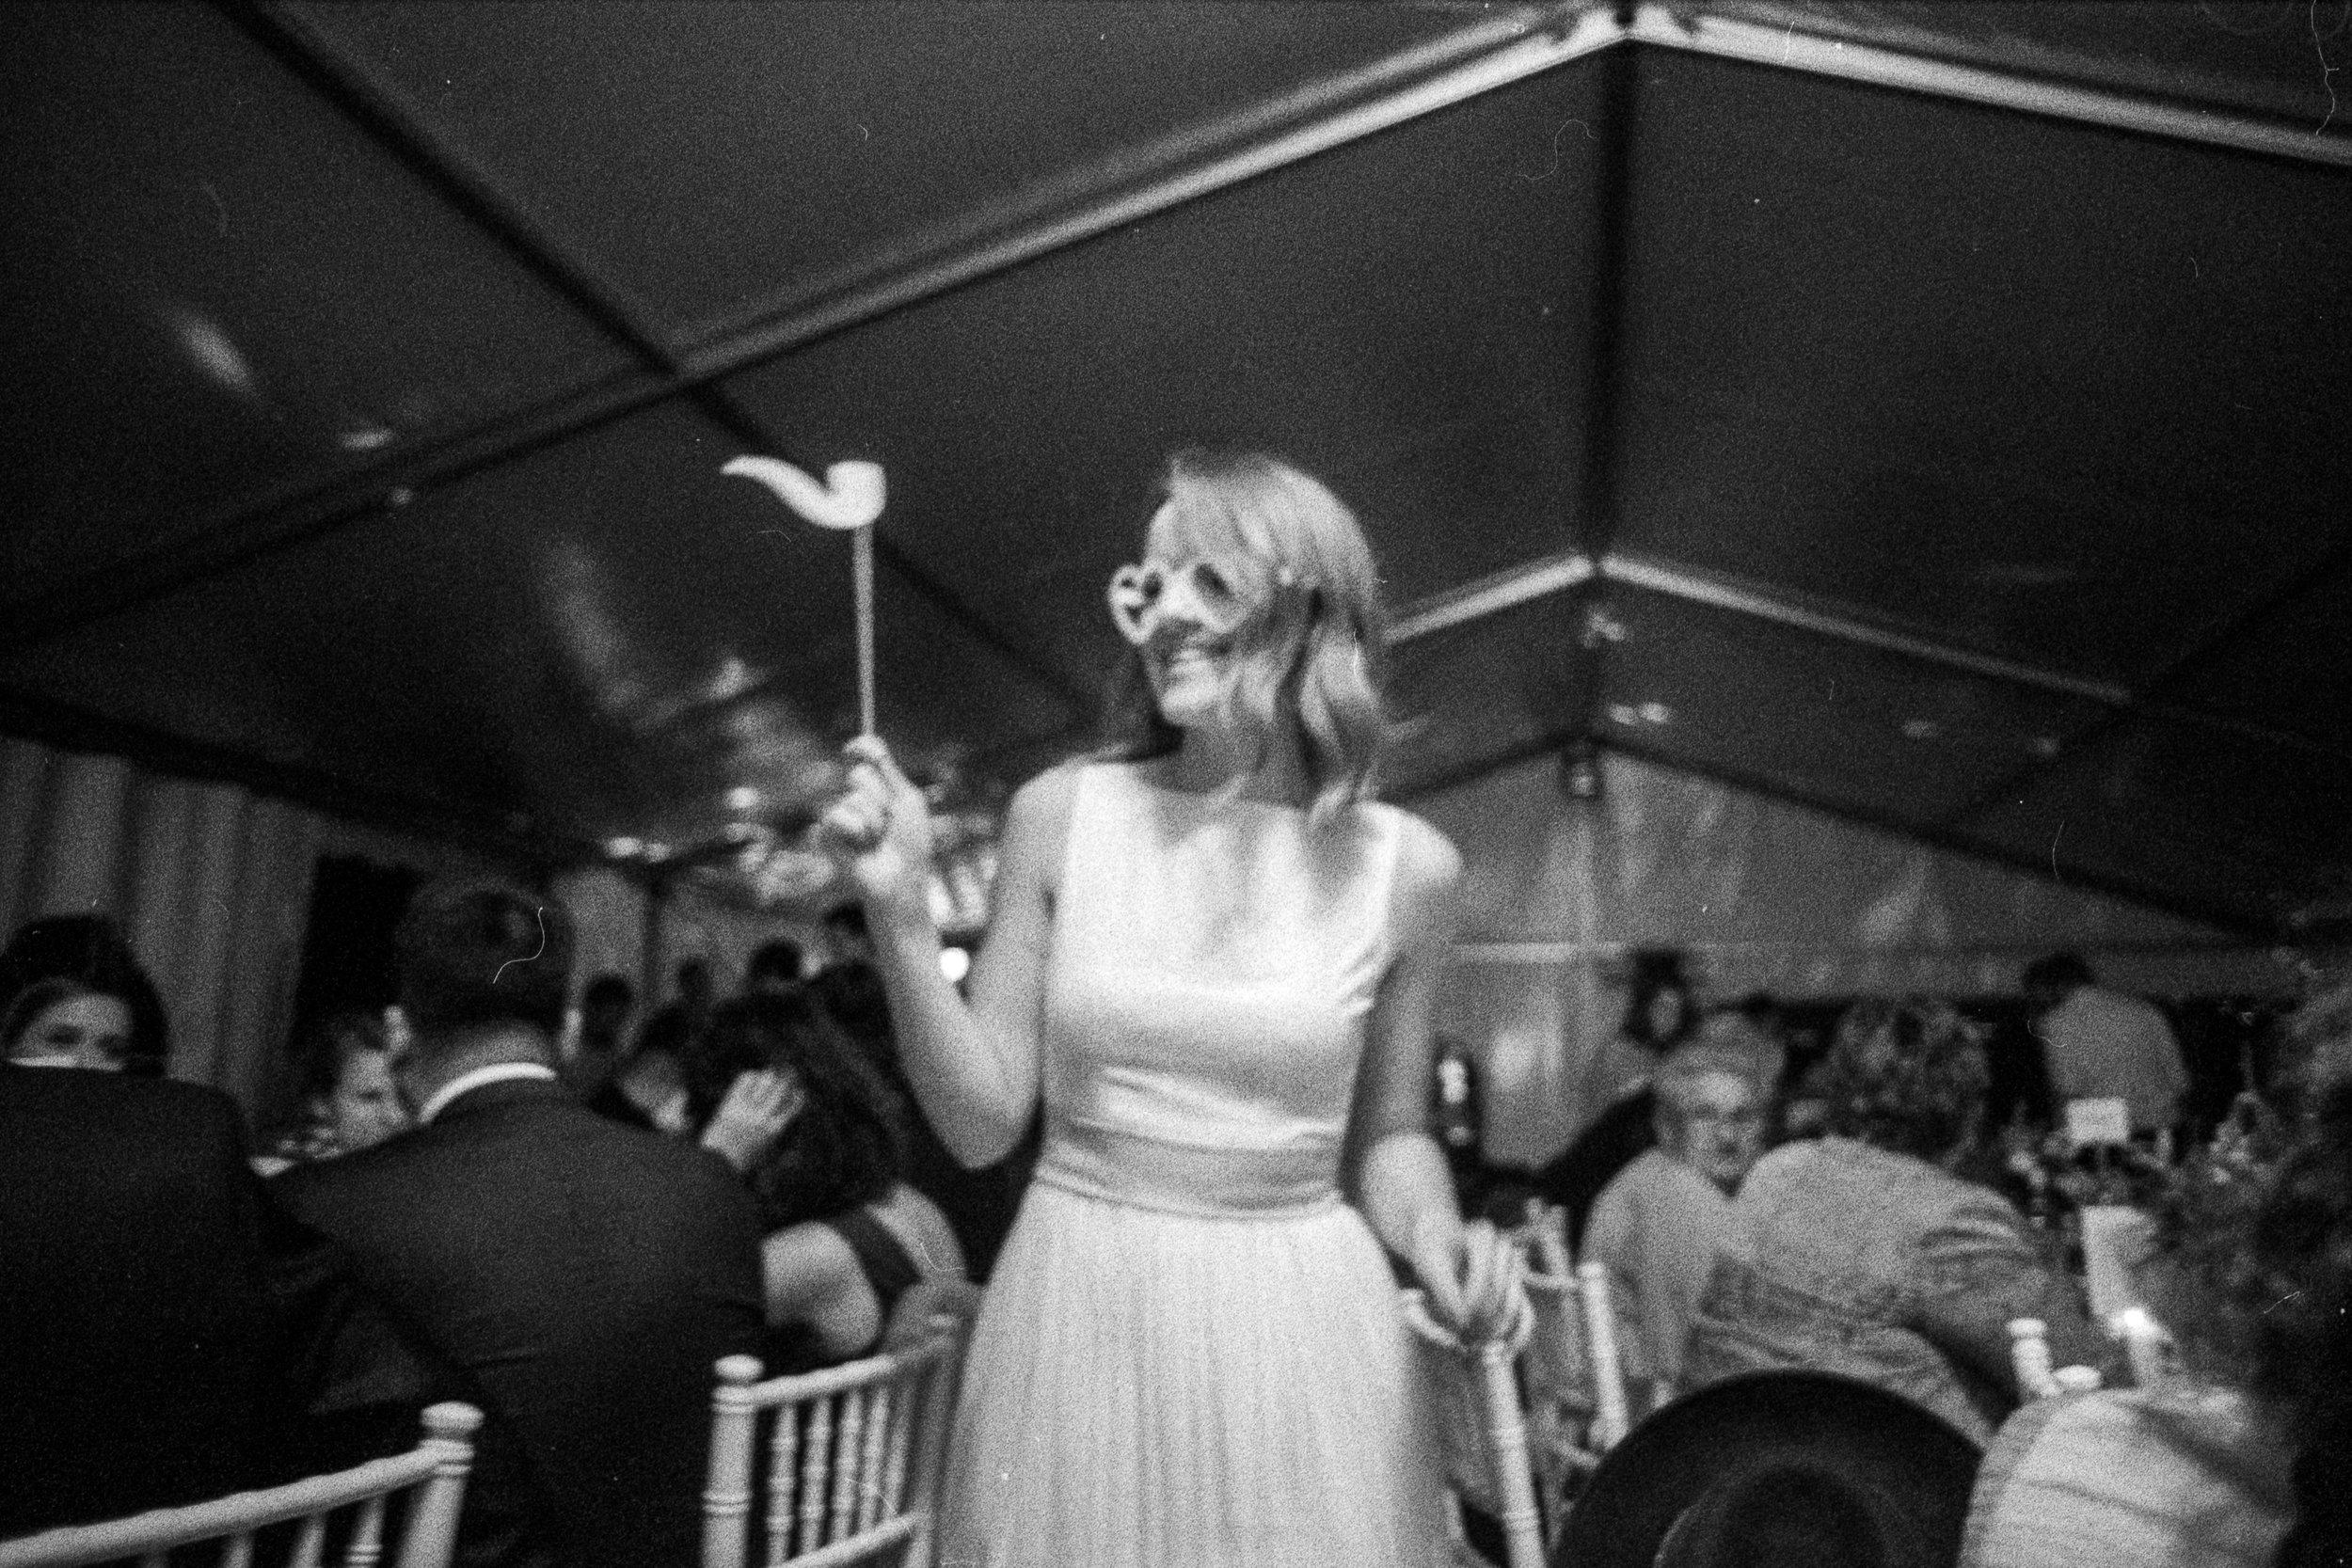 20171006_Monika+Marci_wedding_film_f_033.jpg